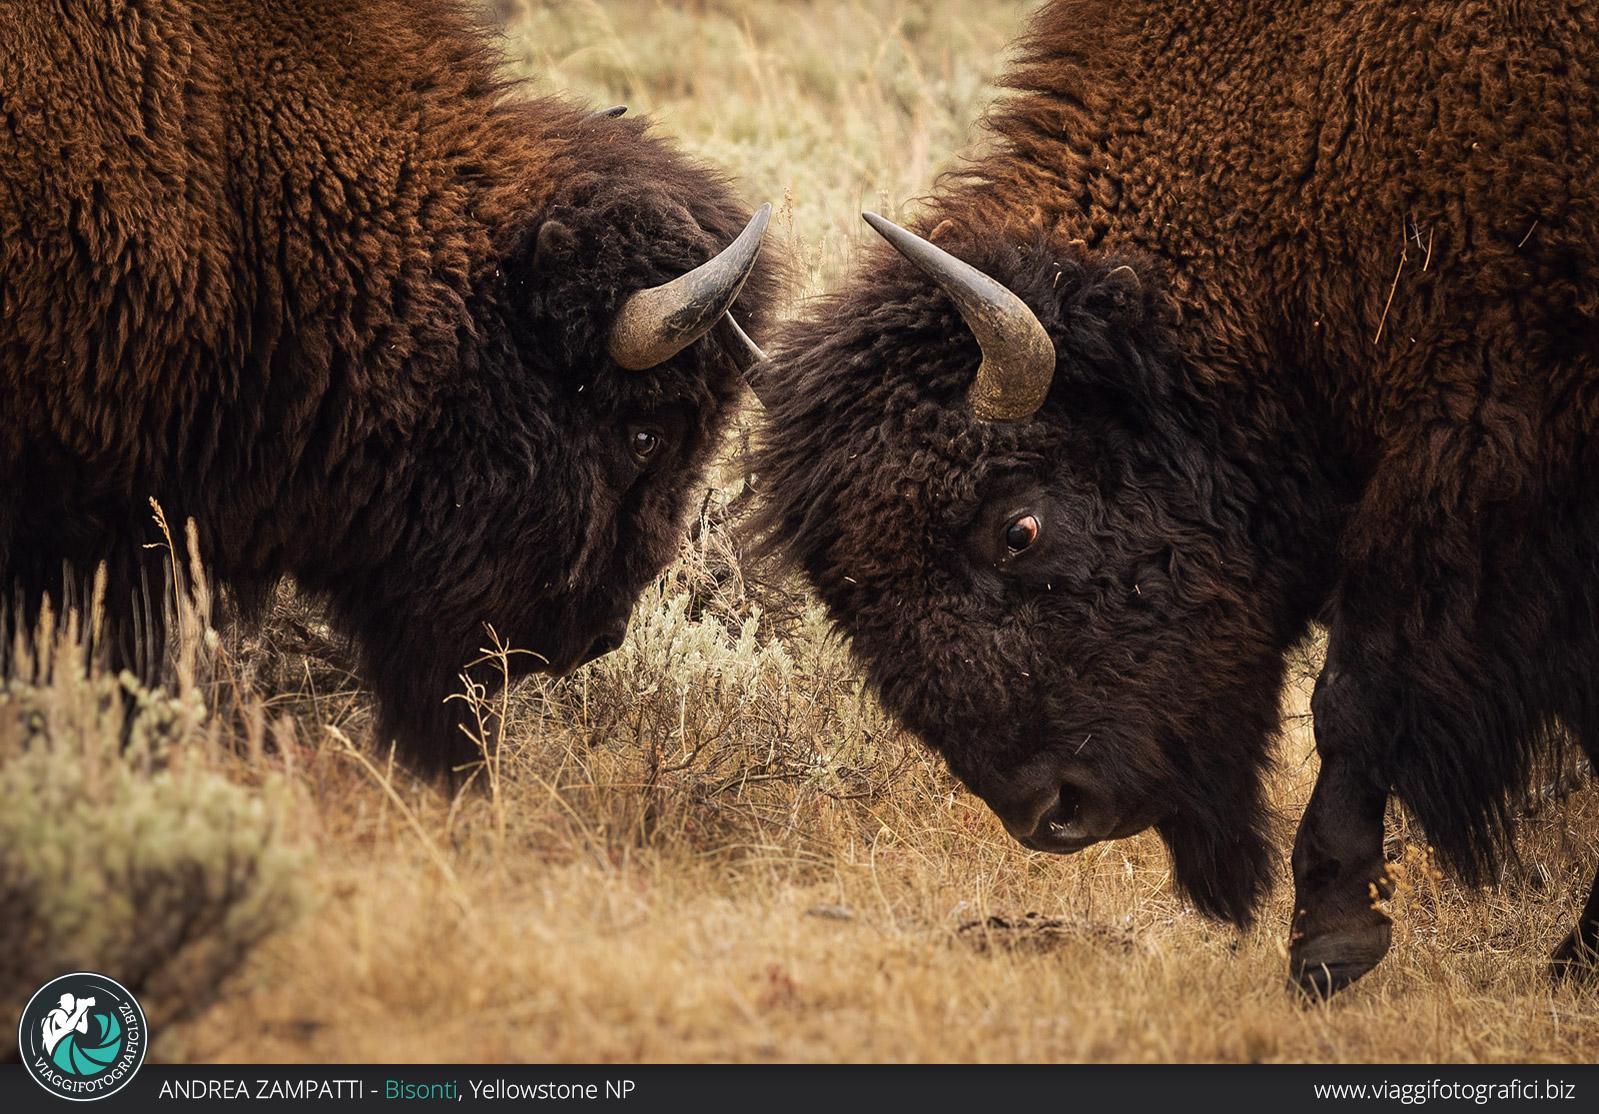 Fotografie di Bisonti a Yellowstone